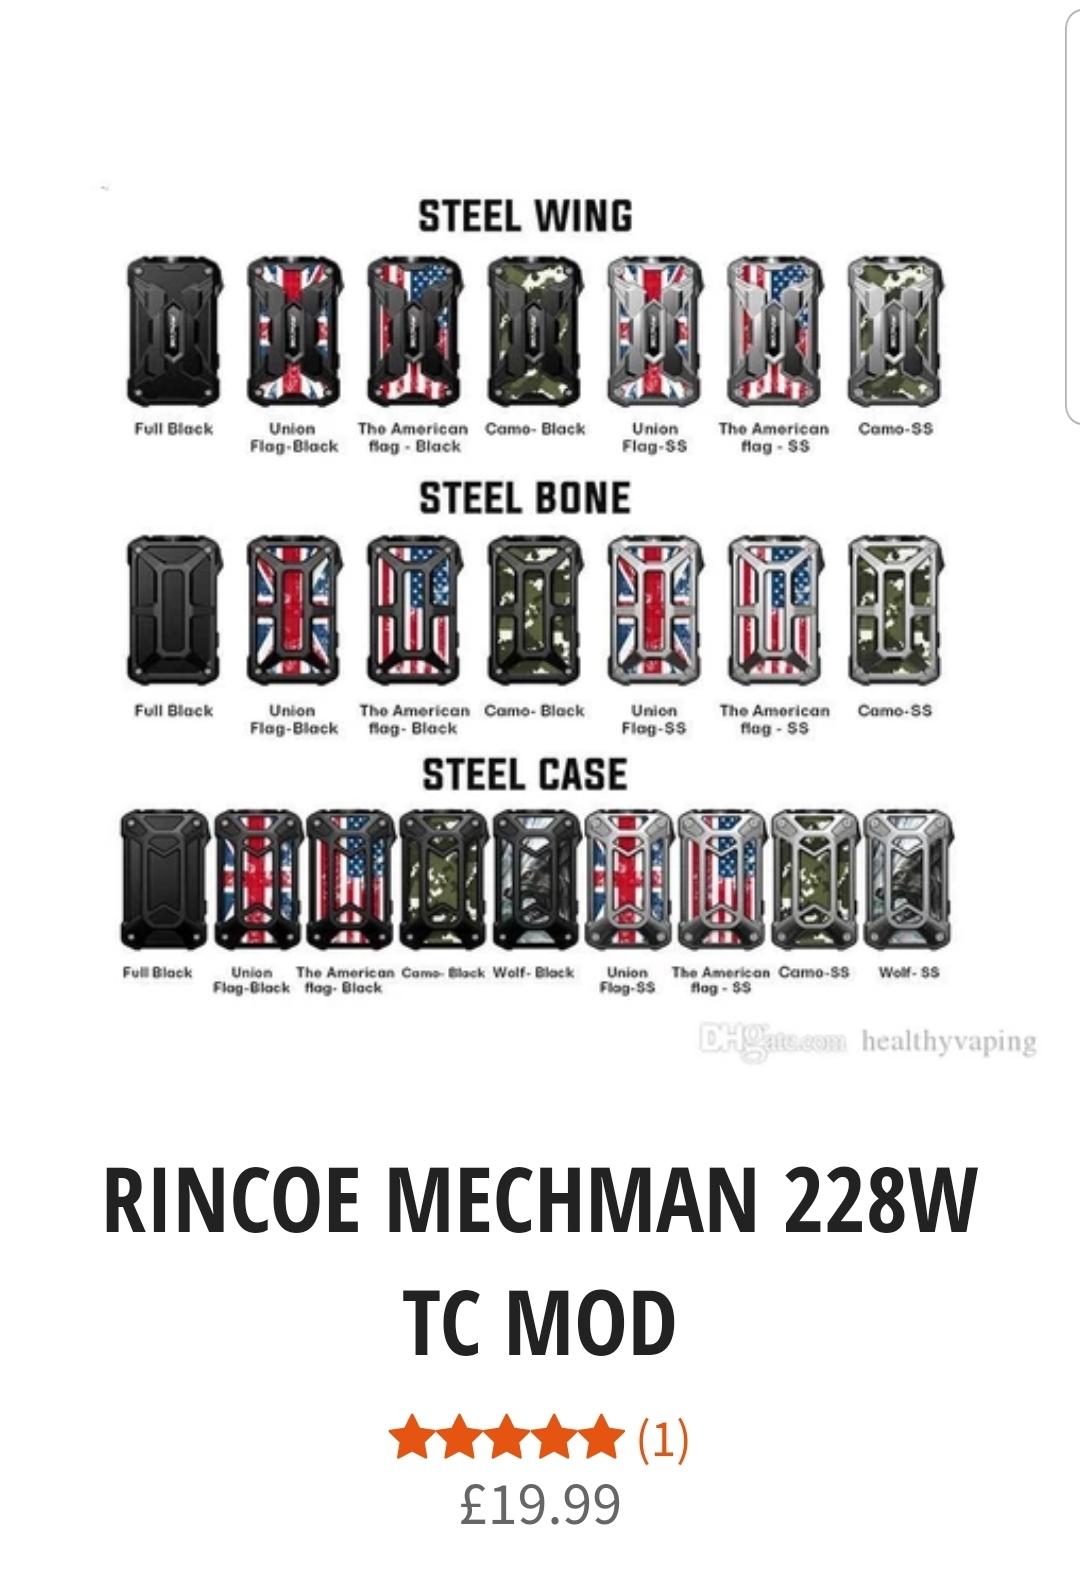 Rincoe Mechman 228w- £19.99